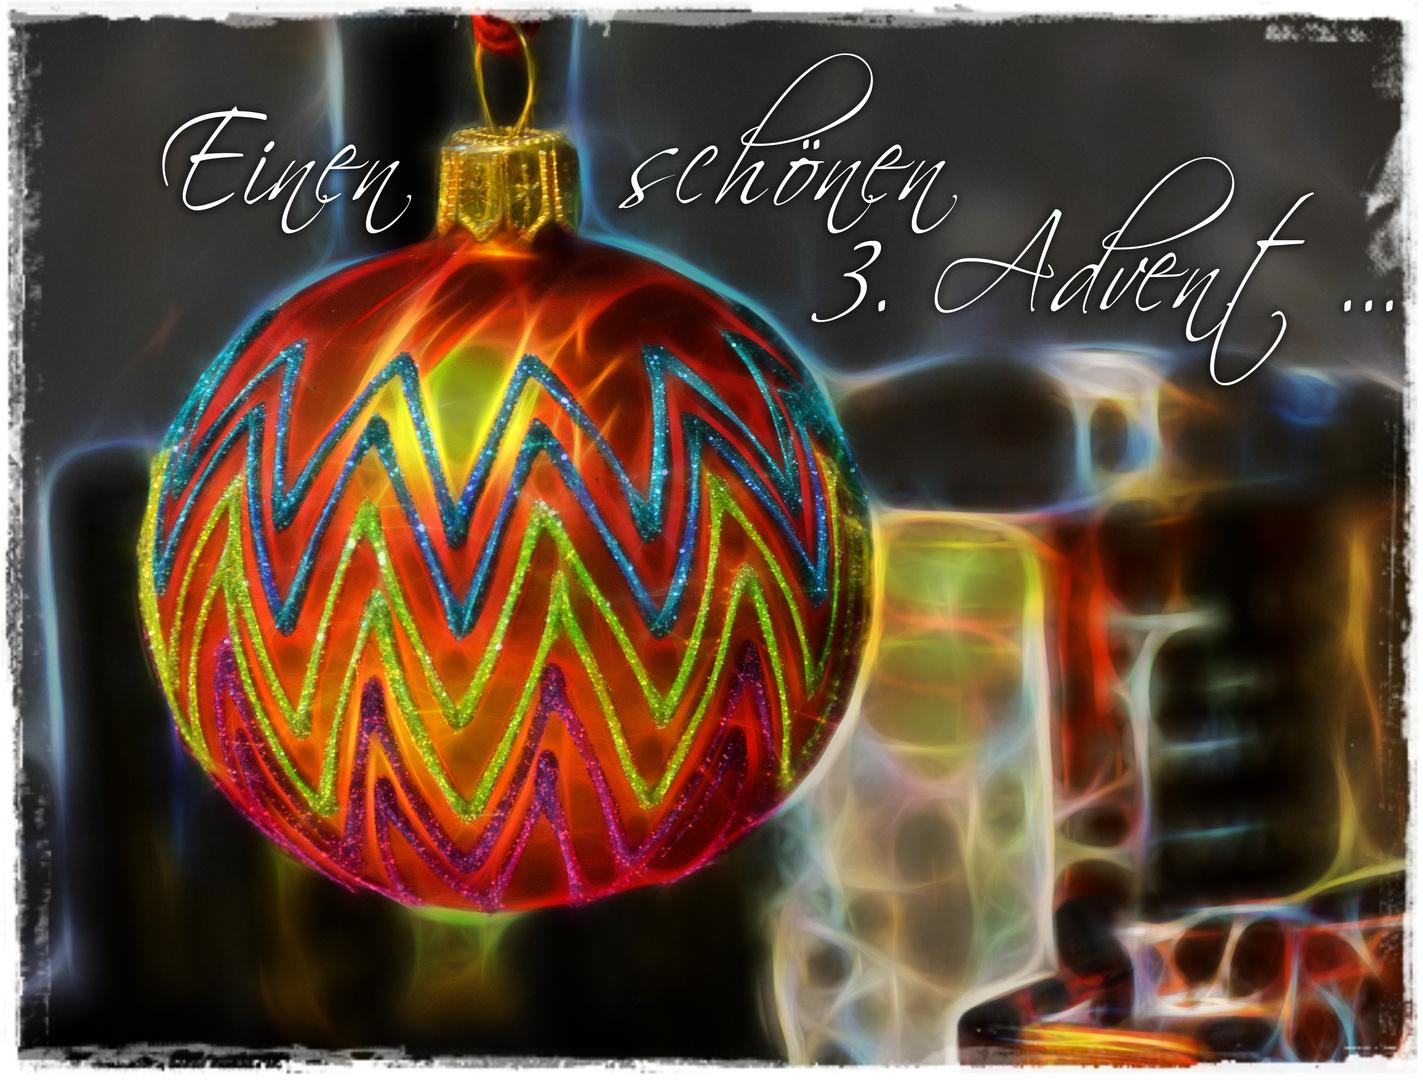 Zum 3. Advent ...